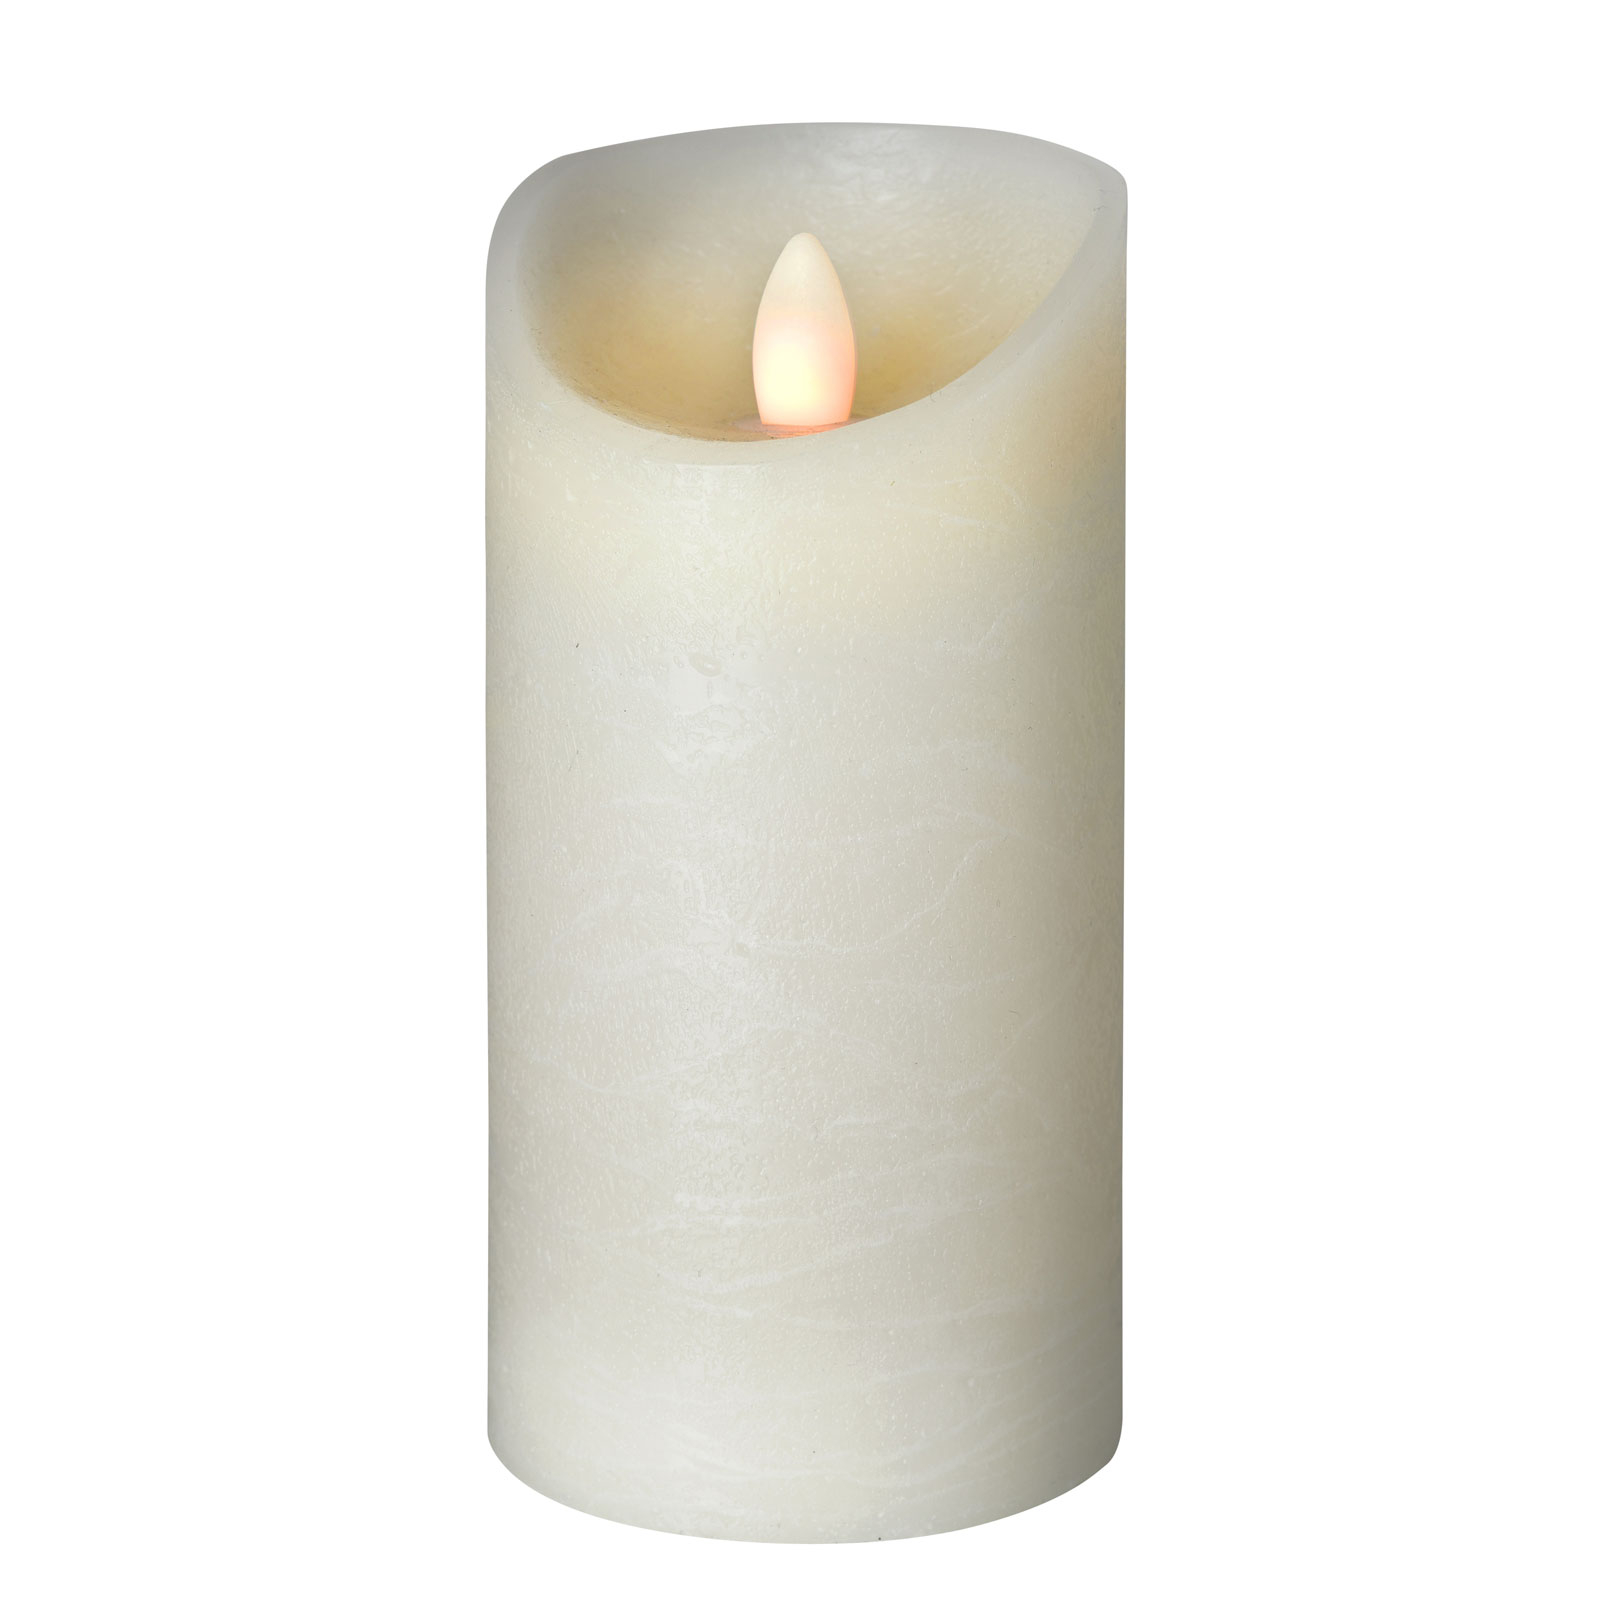 Shine LED-lys, Ø 7,5 cm, elfenben, højde 17,5 cm